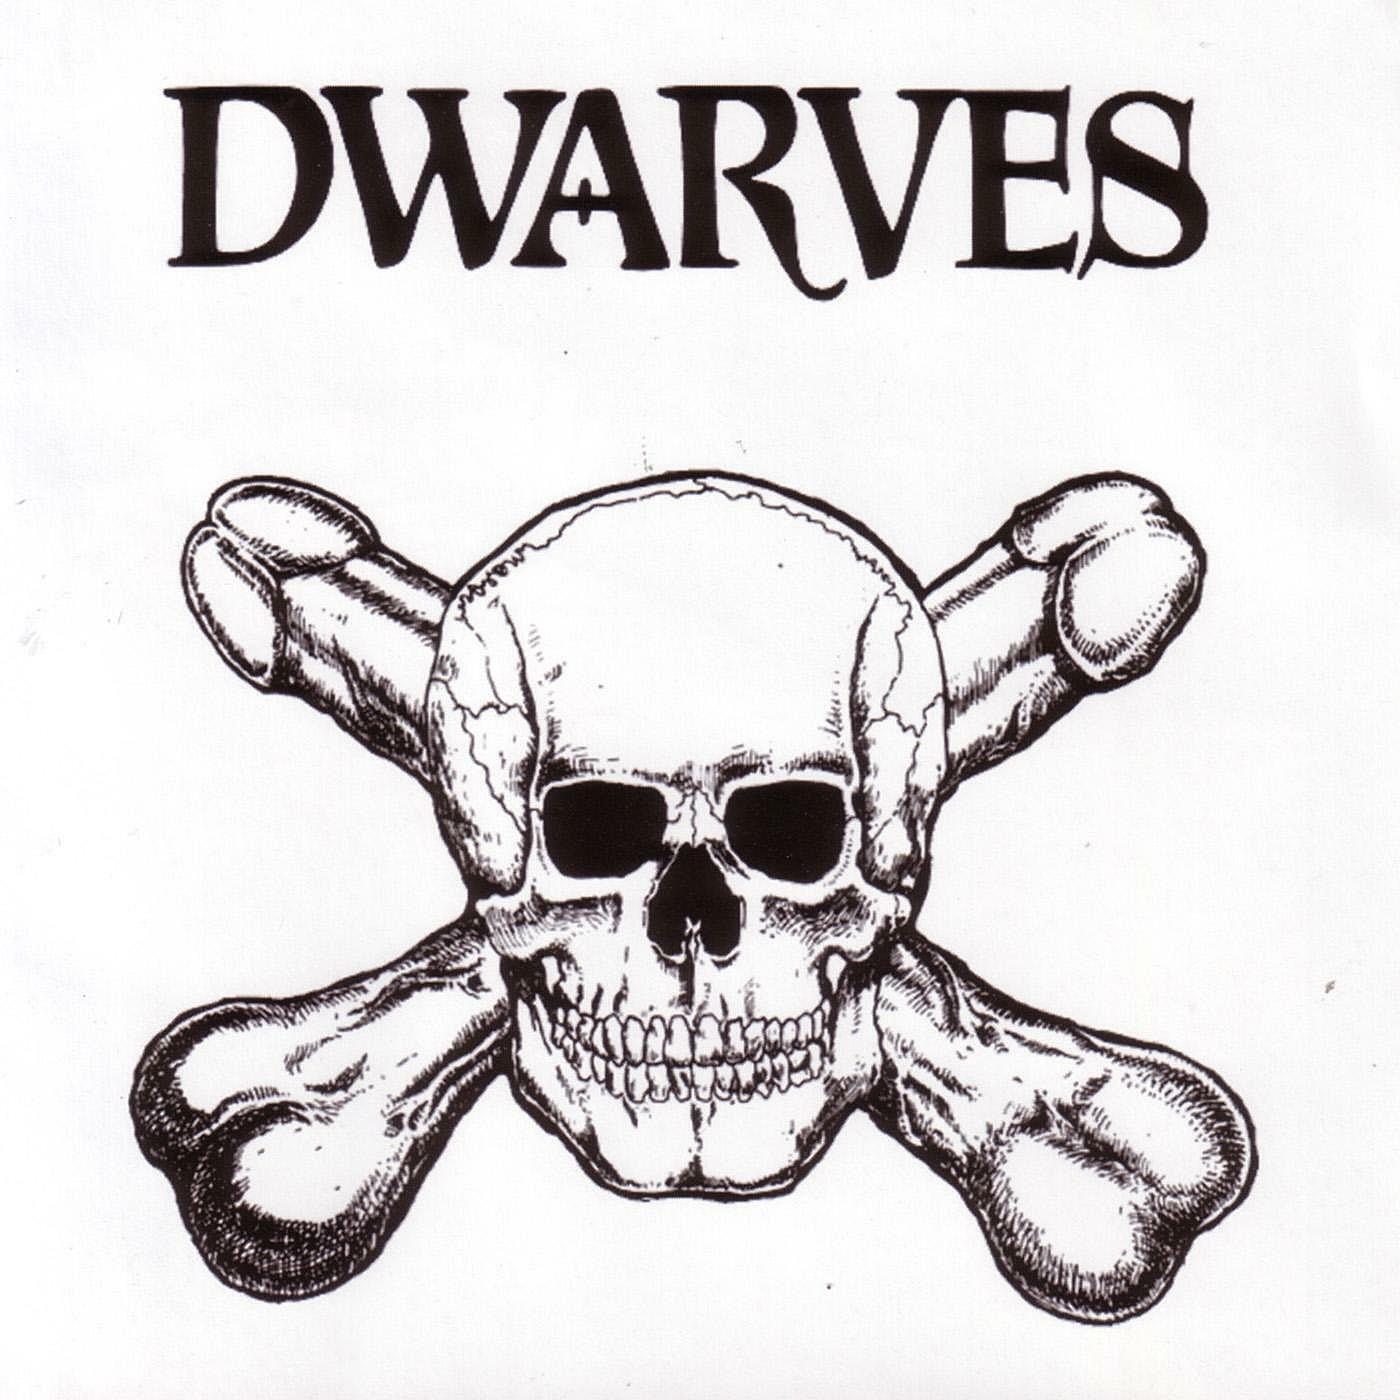 Dwarves blood guts pussy porn babes